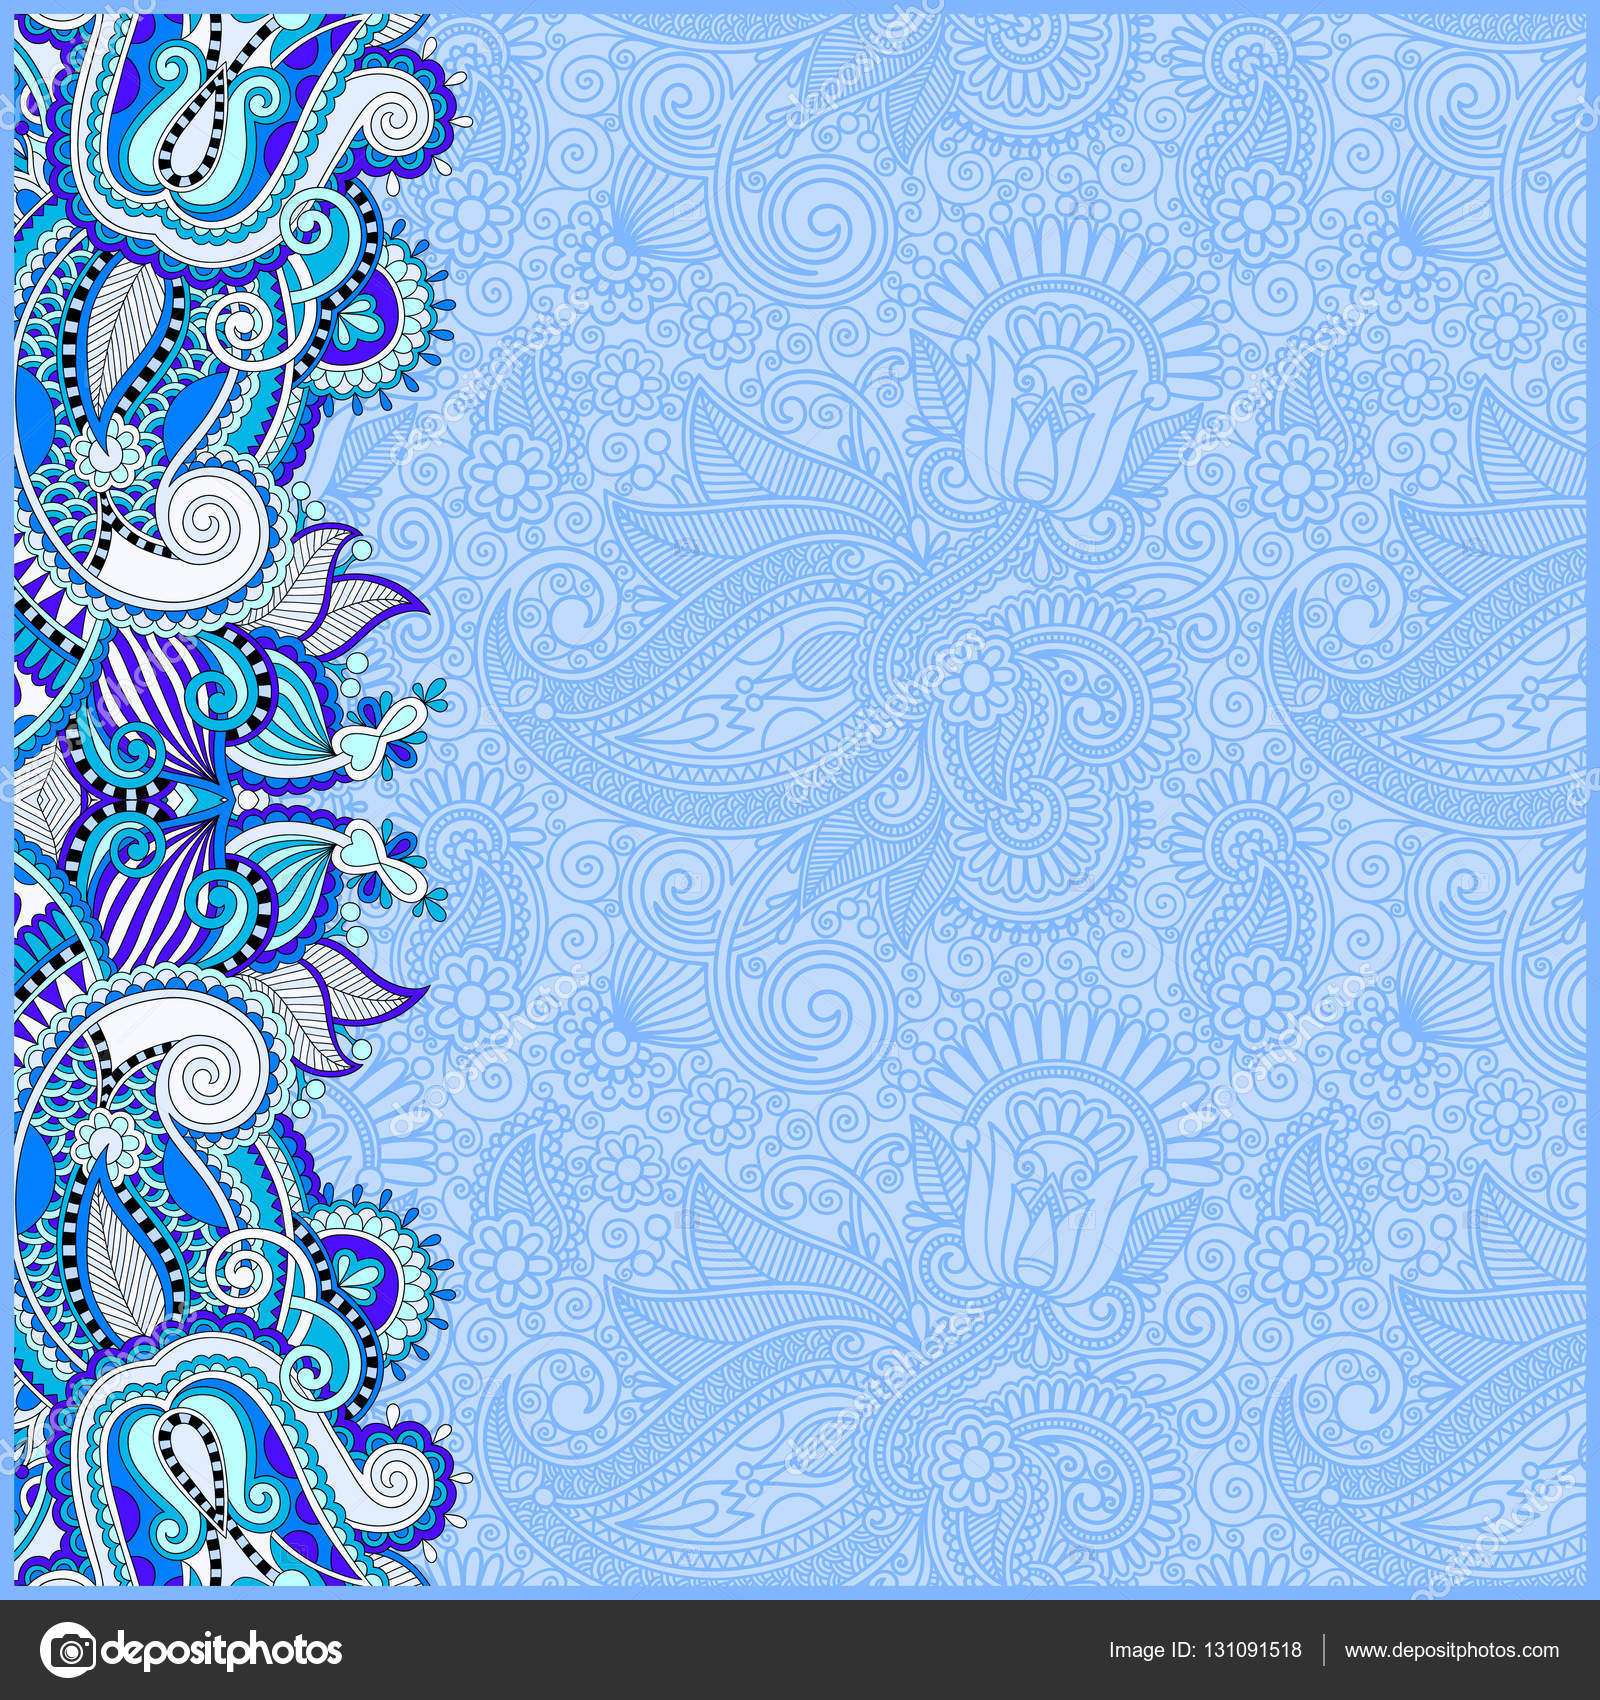 25 Inspirational Blue Invitation Background Designs For Debut